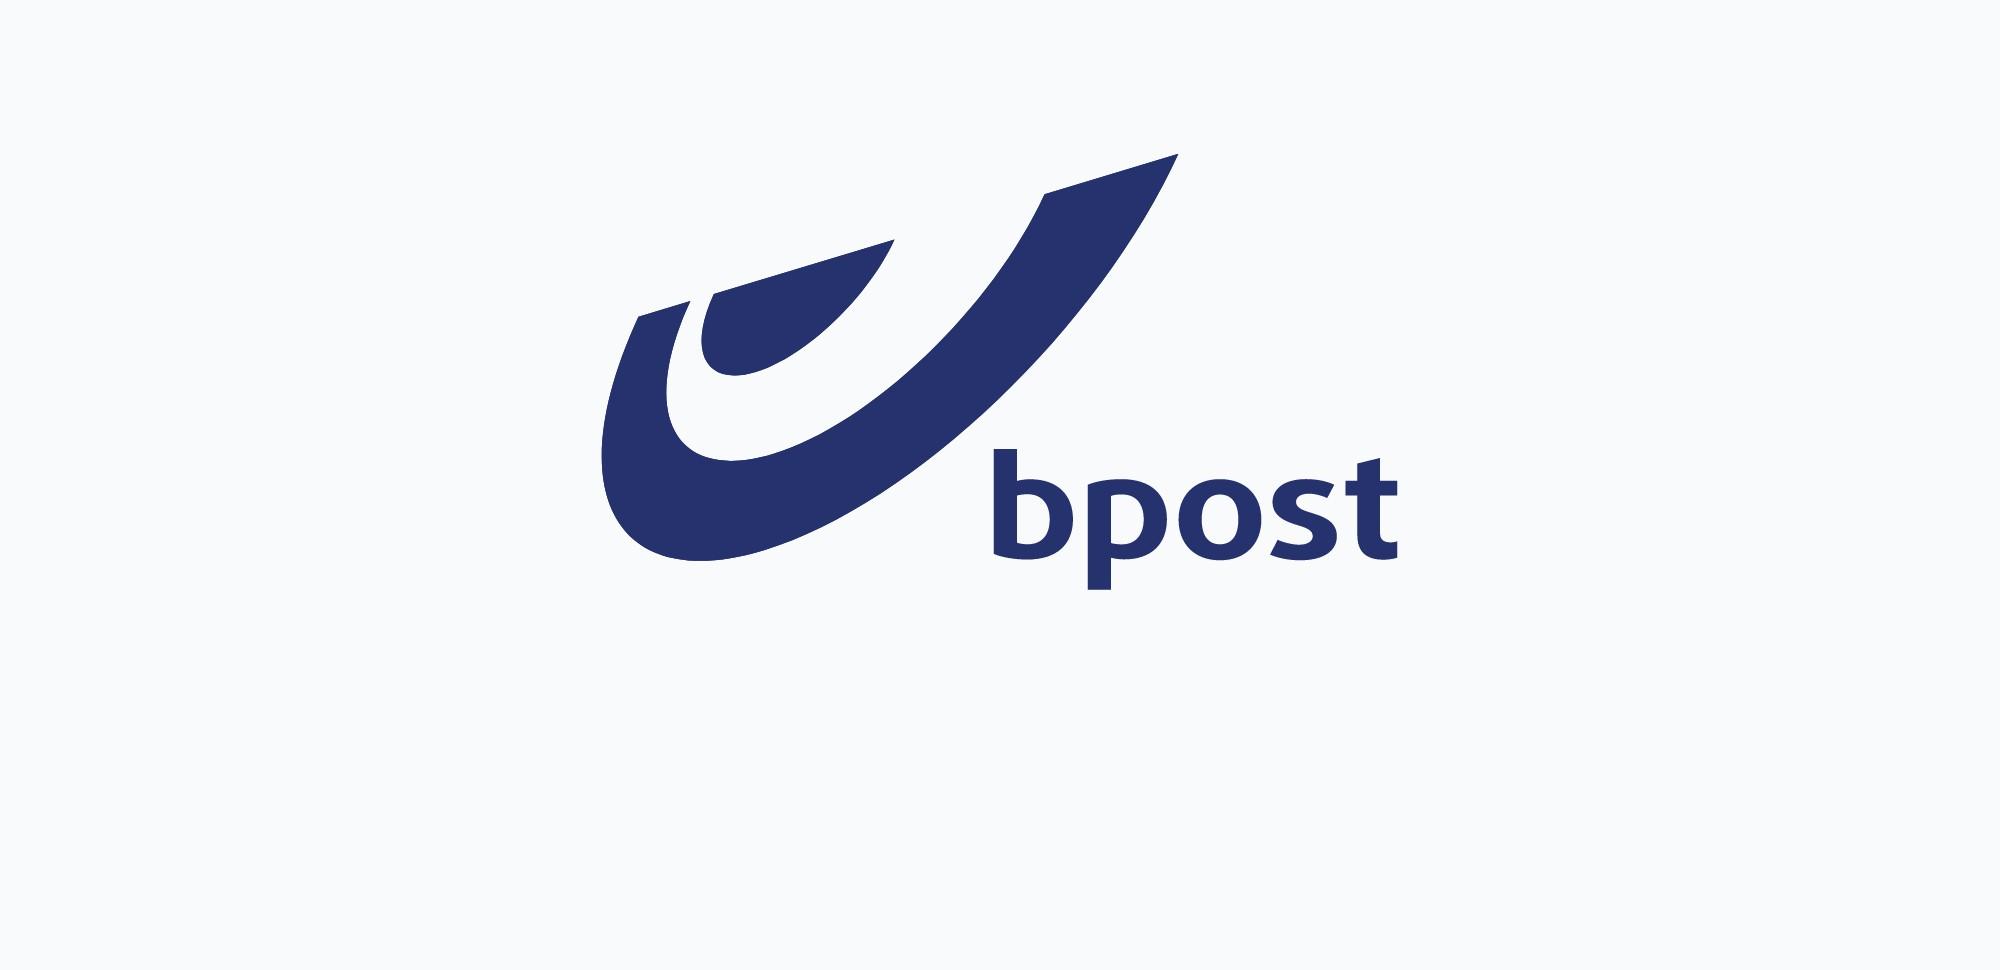 Bpost Shopify App